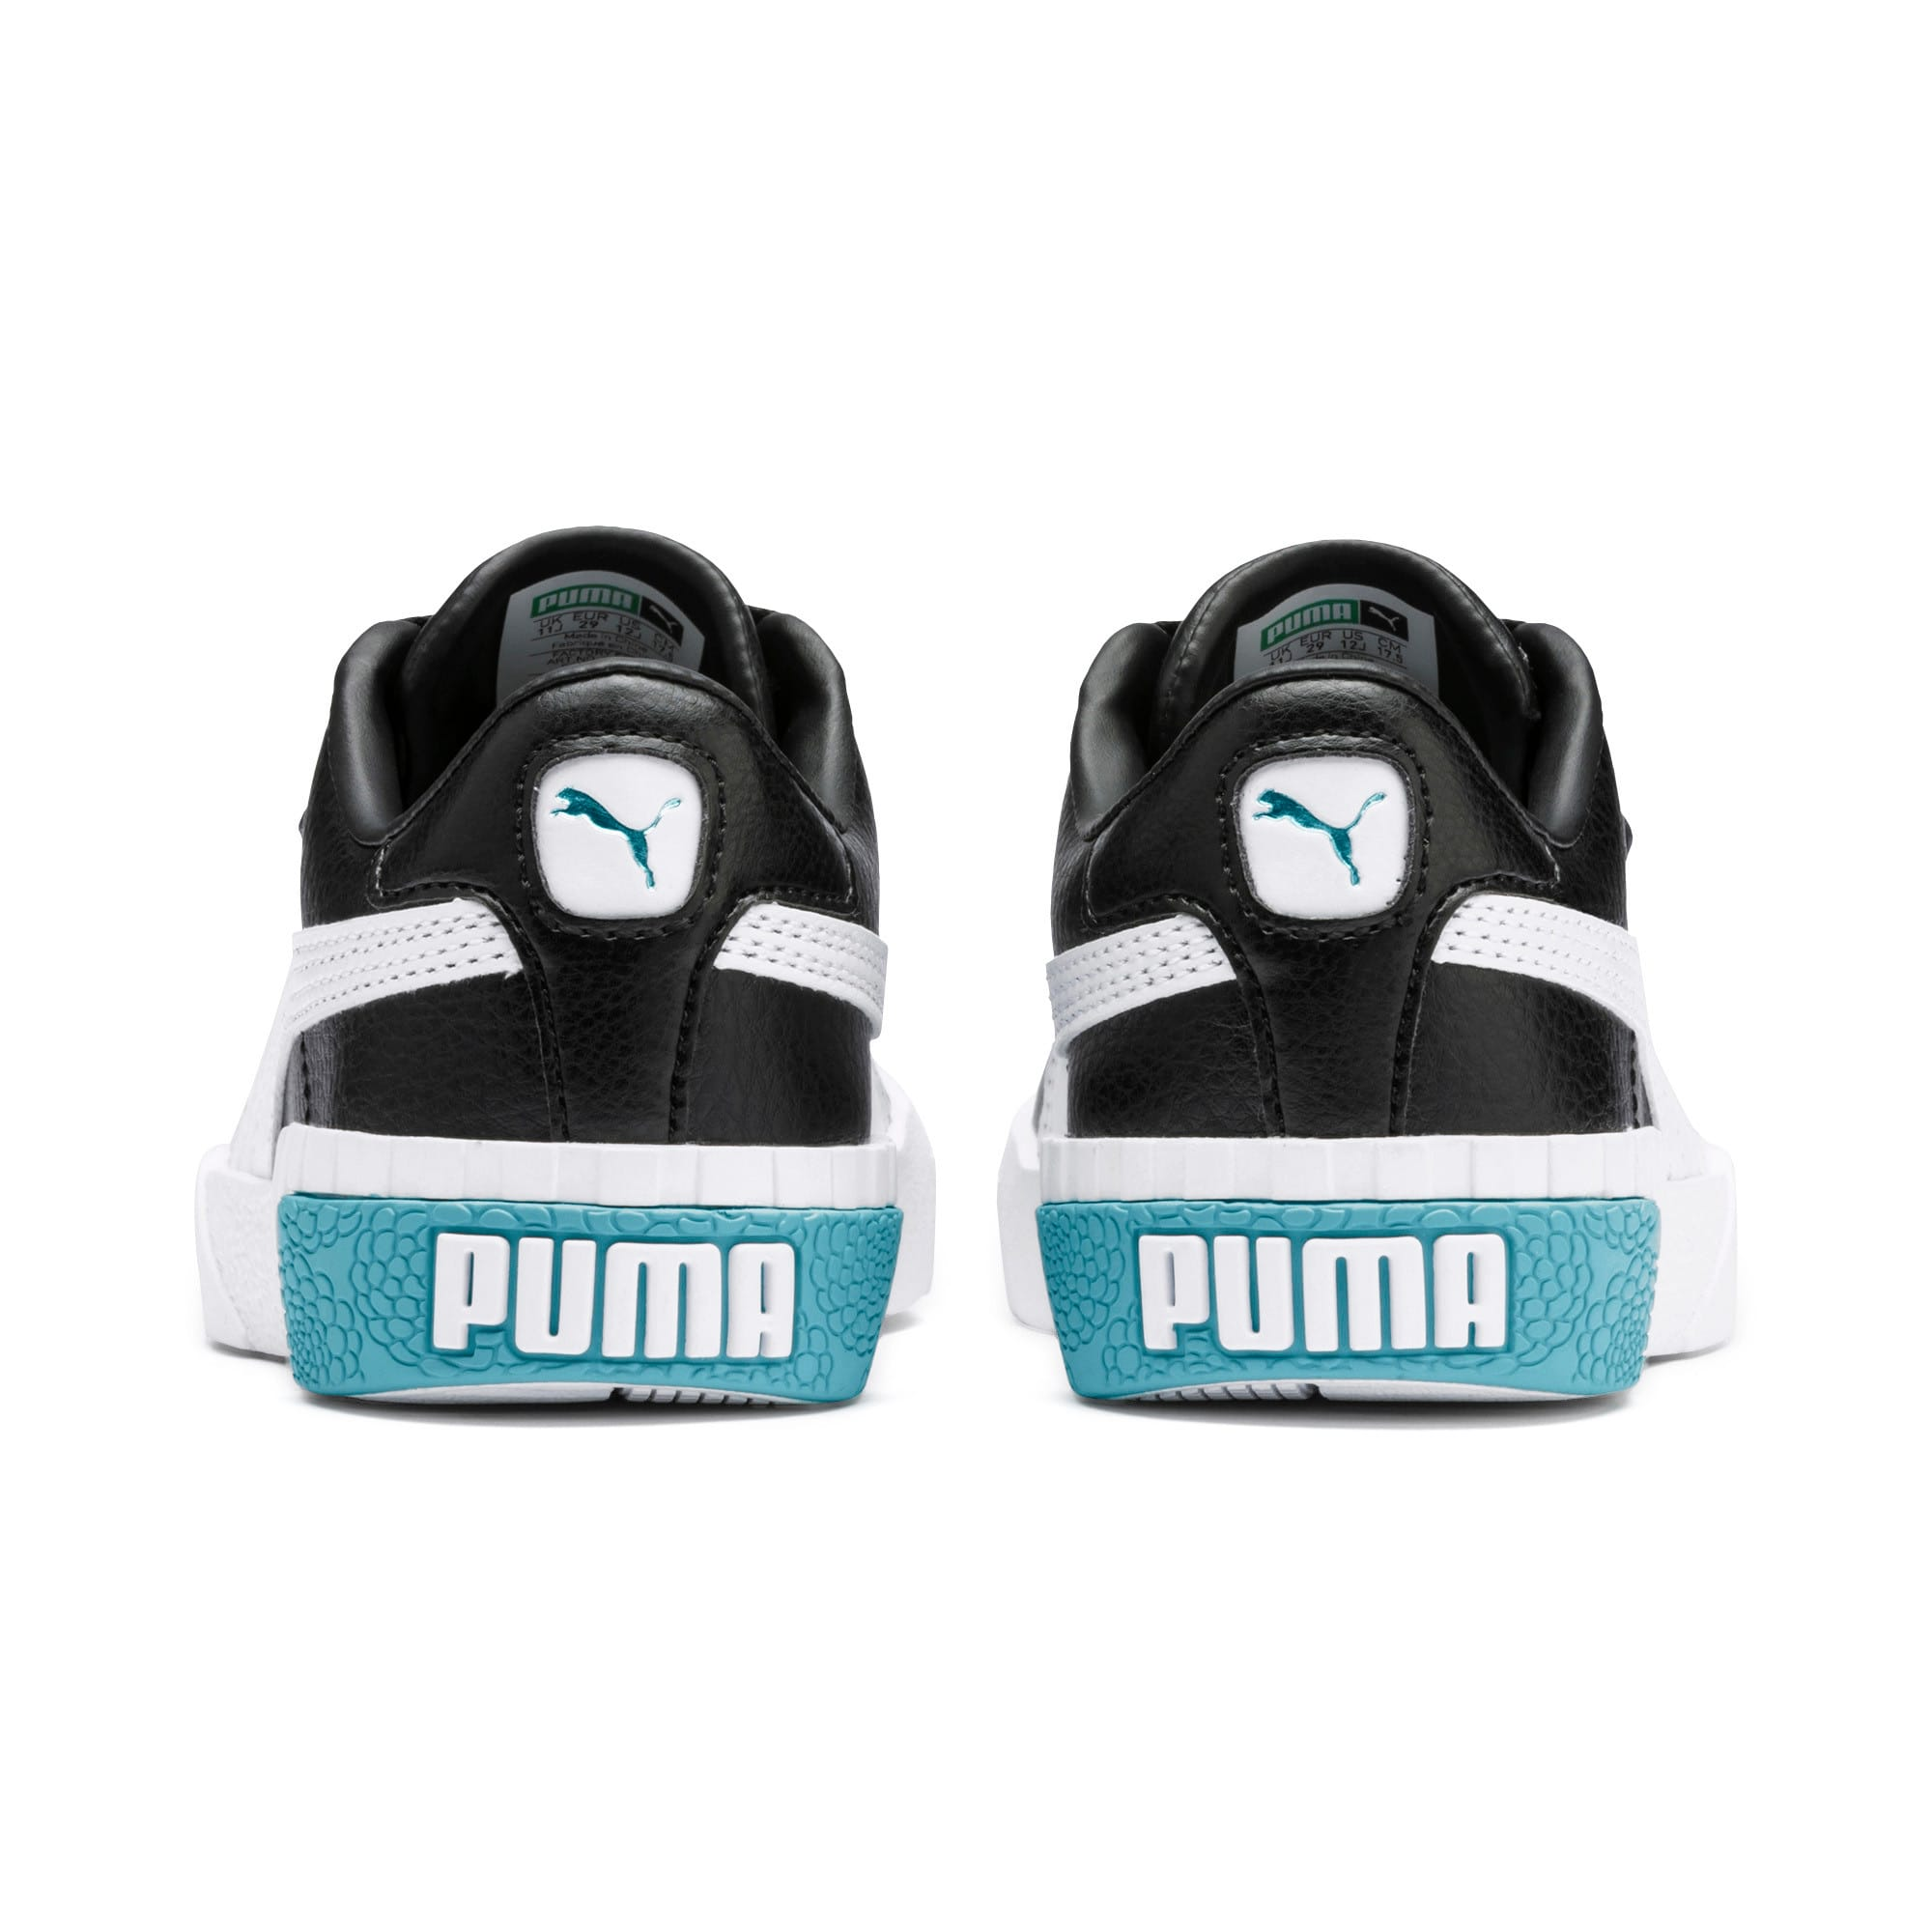 Thumbnail 3 of Cali Little Kids' Shoes, Puma Black-Milky Blue, medium